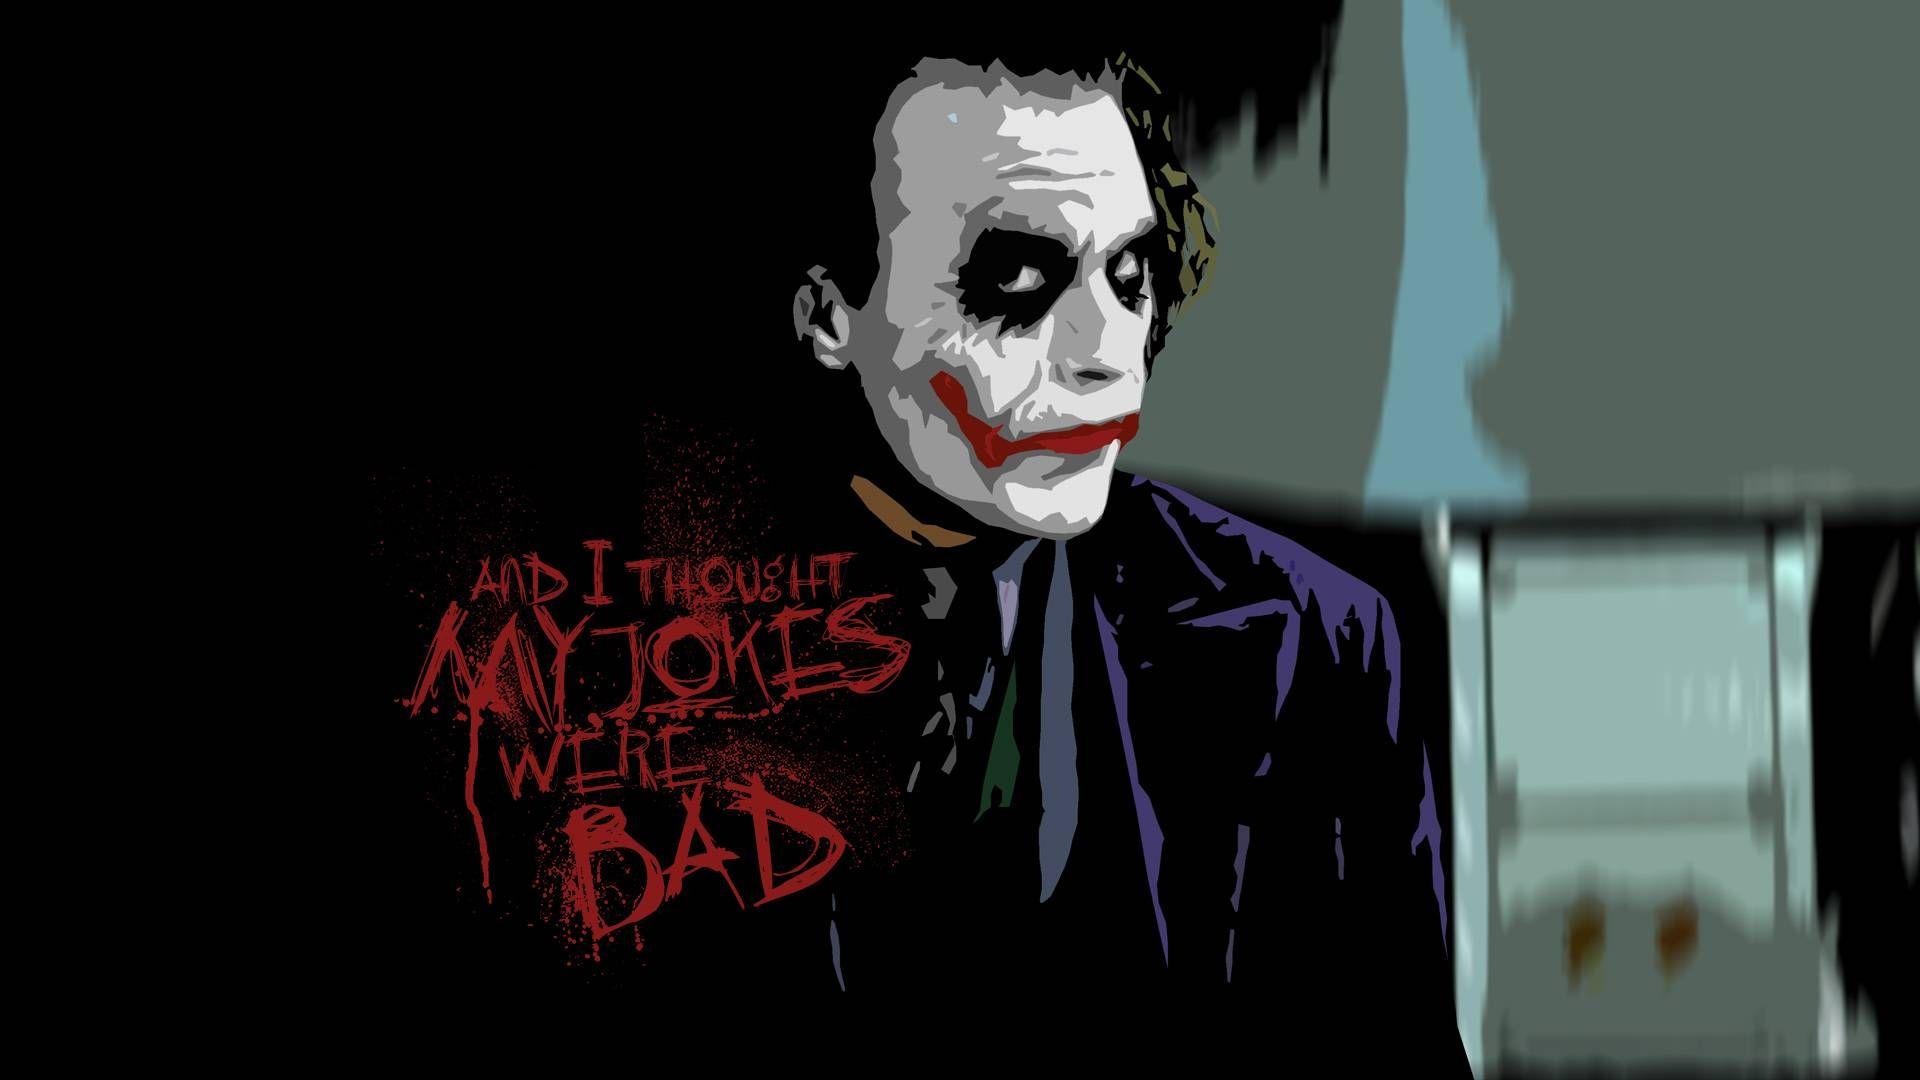 Joker Desktop Backgrounds Wallpaper Cave Joker Images Joker Wallpapers Joker Hd Wallpaper